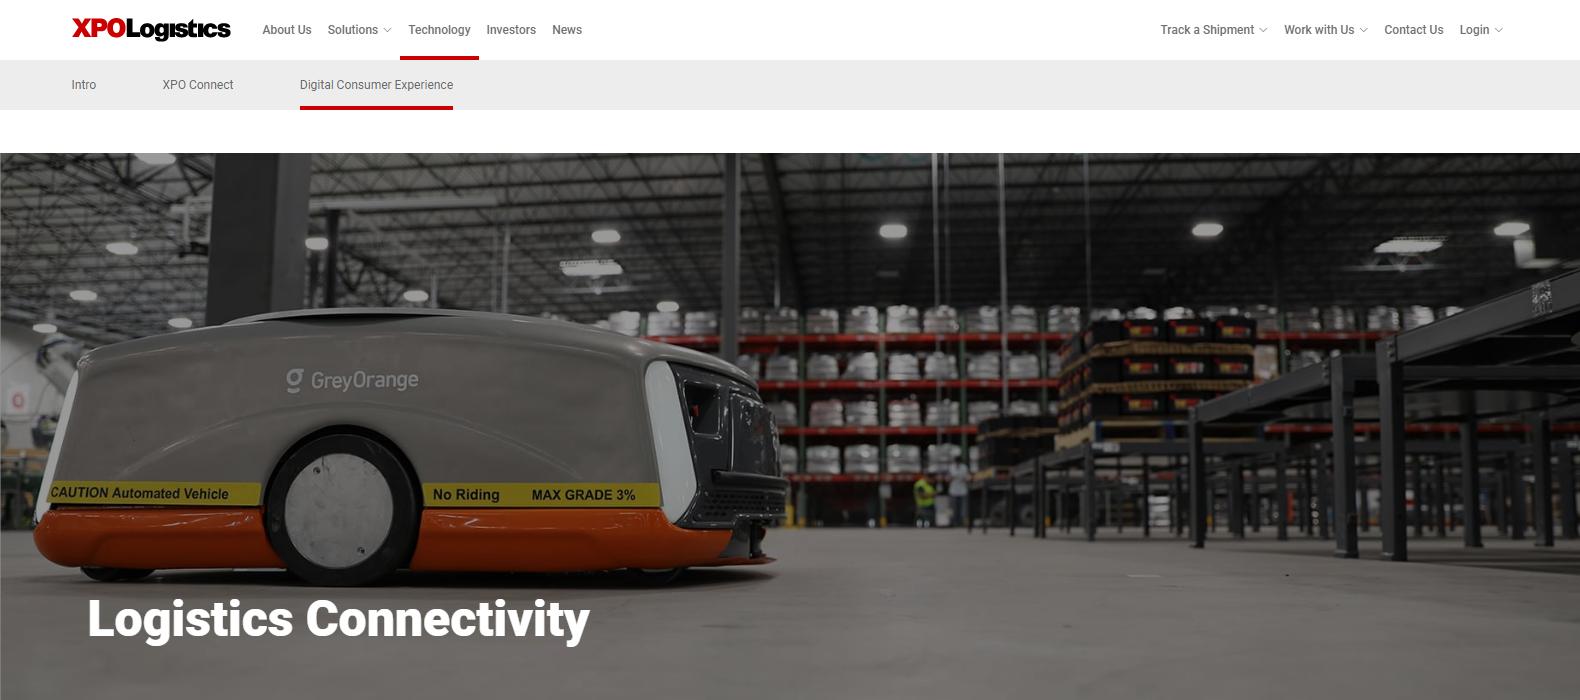 XPO Logistics Best Logistics Company